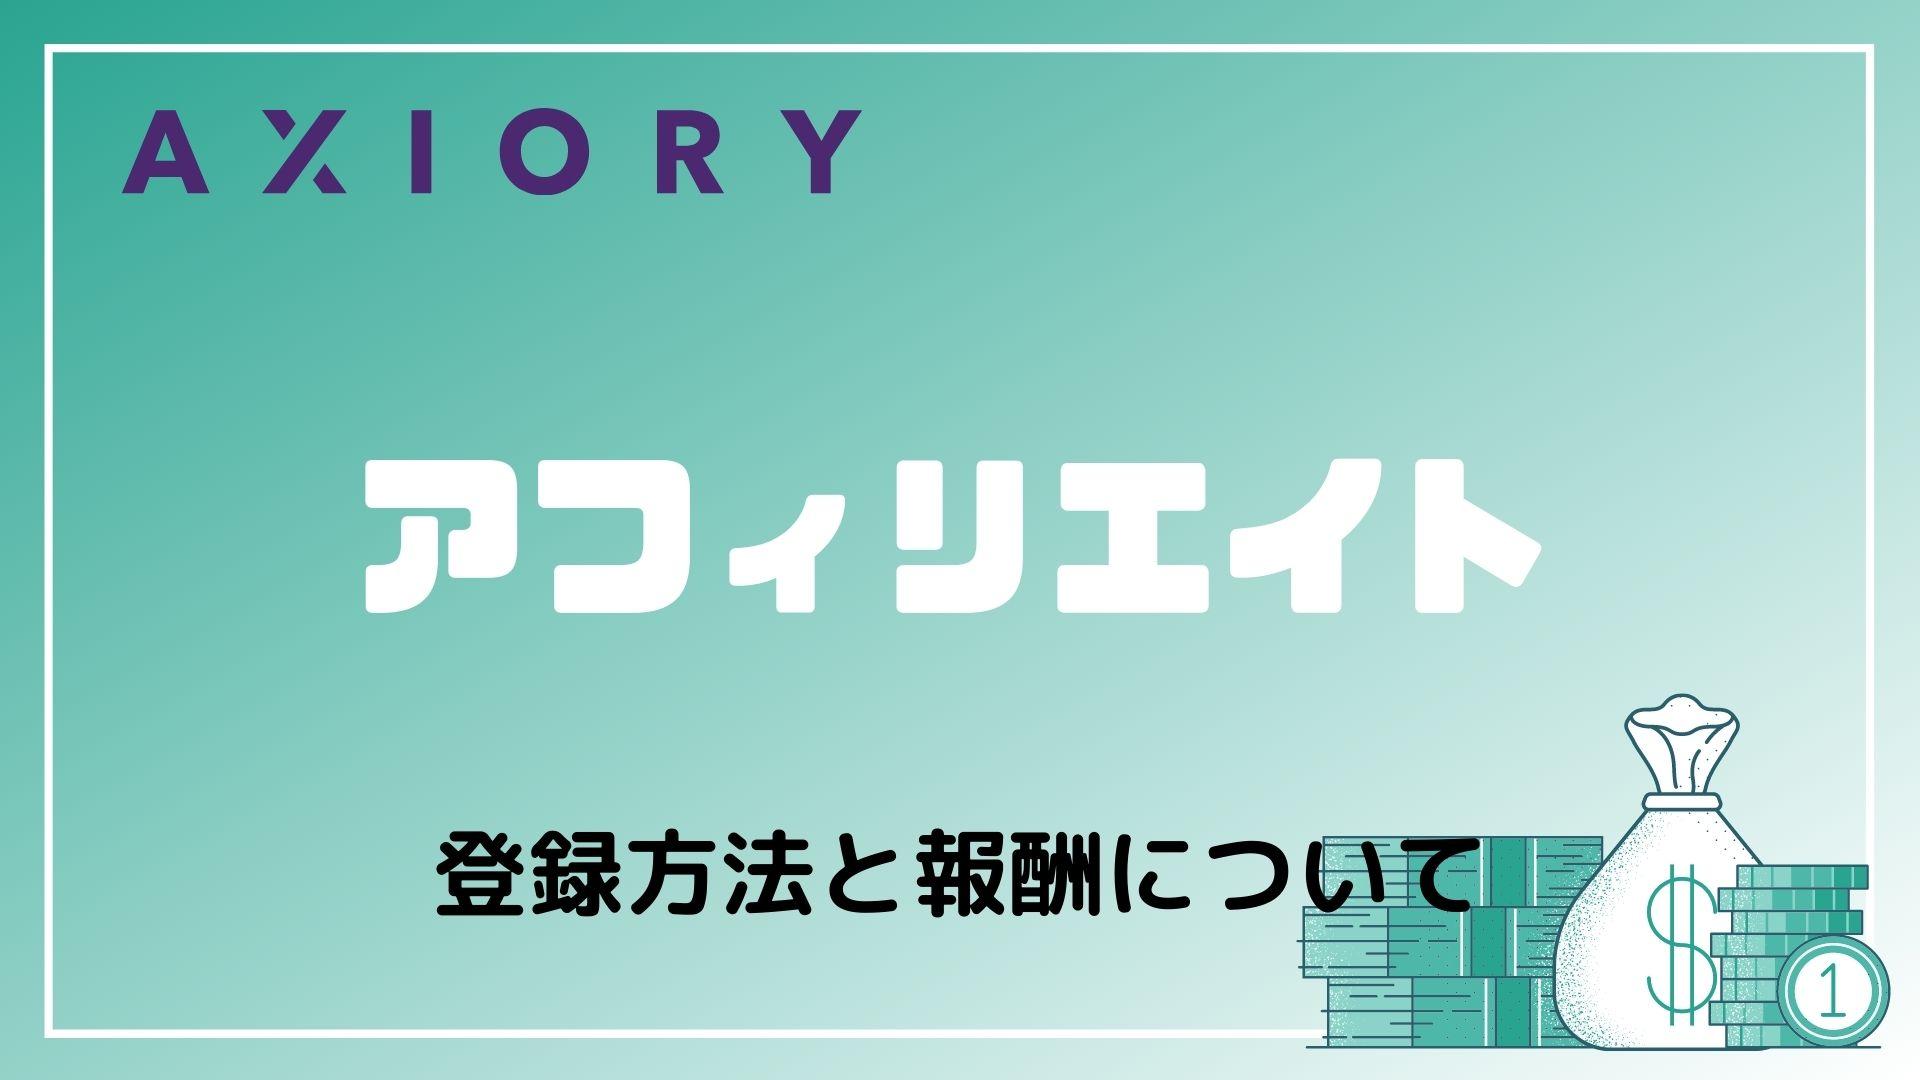 axiory-ib-affiliate-title